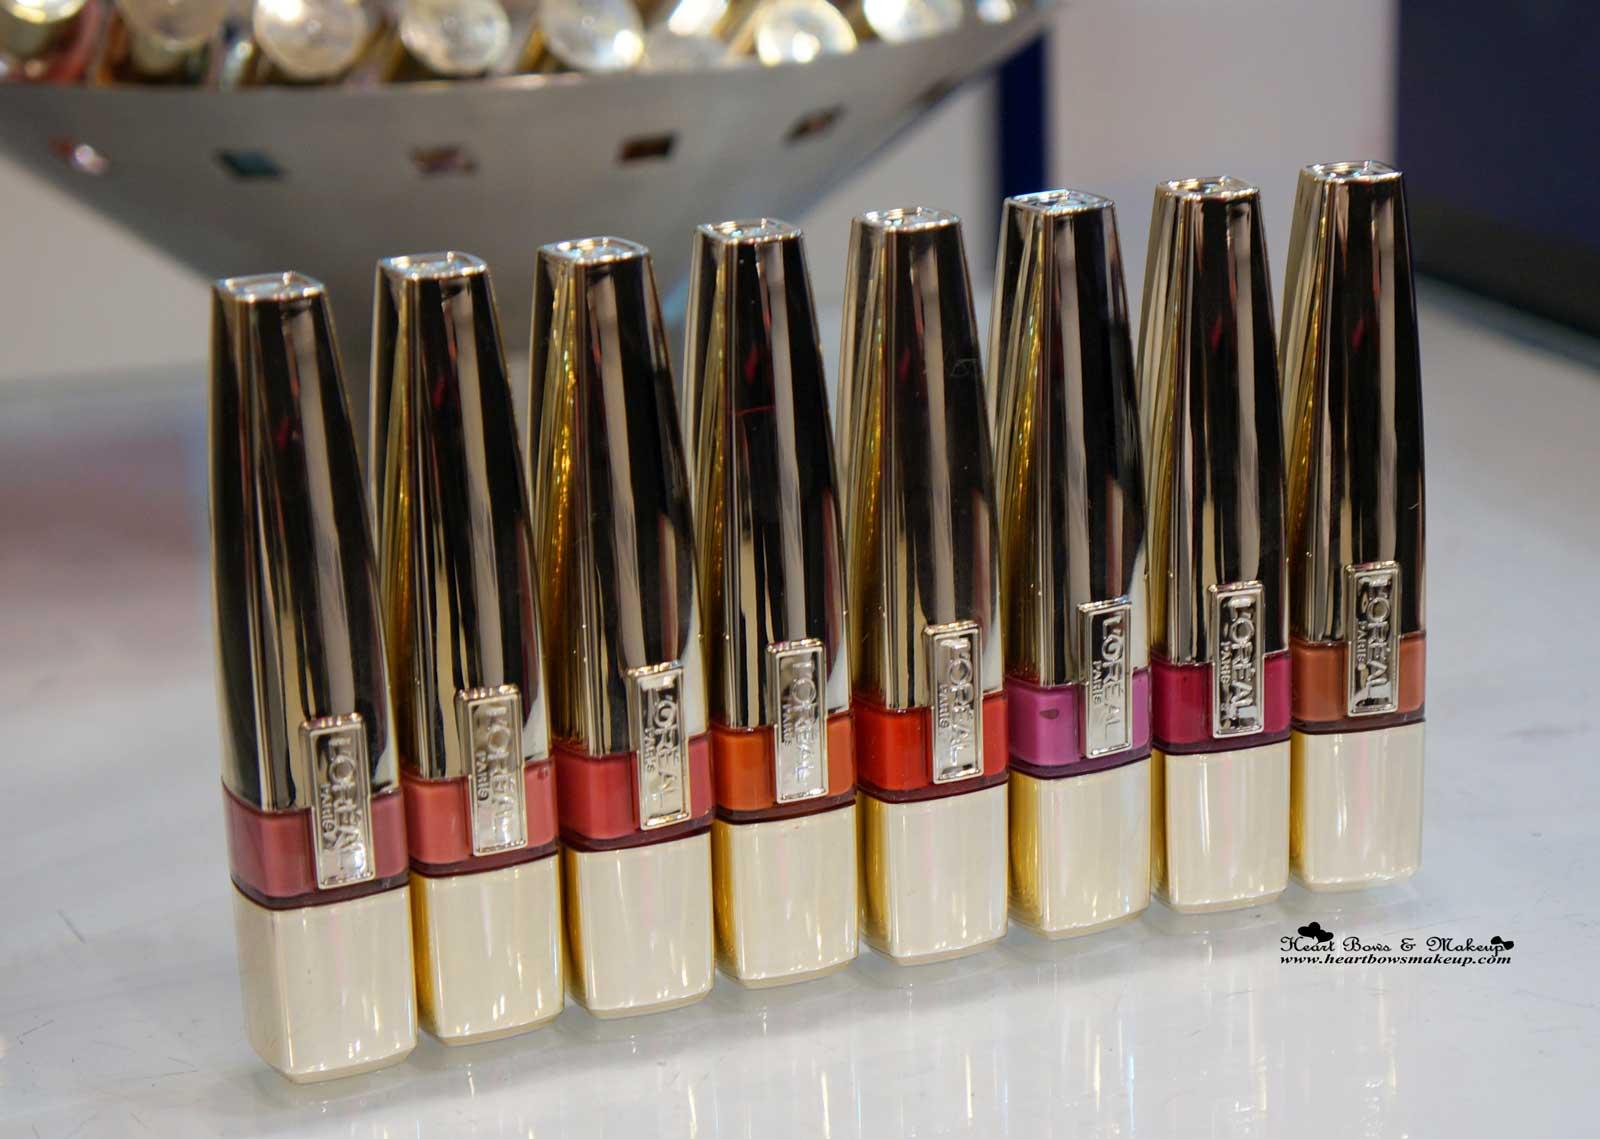 All L'oreal Shine Caresse Lip Colors Swatches Lolita Venus Bella Faye Juliette Milady Eve Pretty Woman